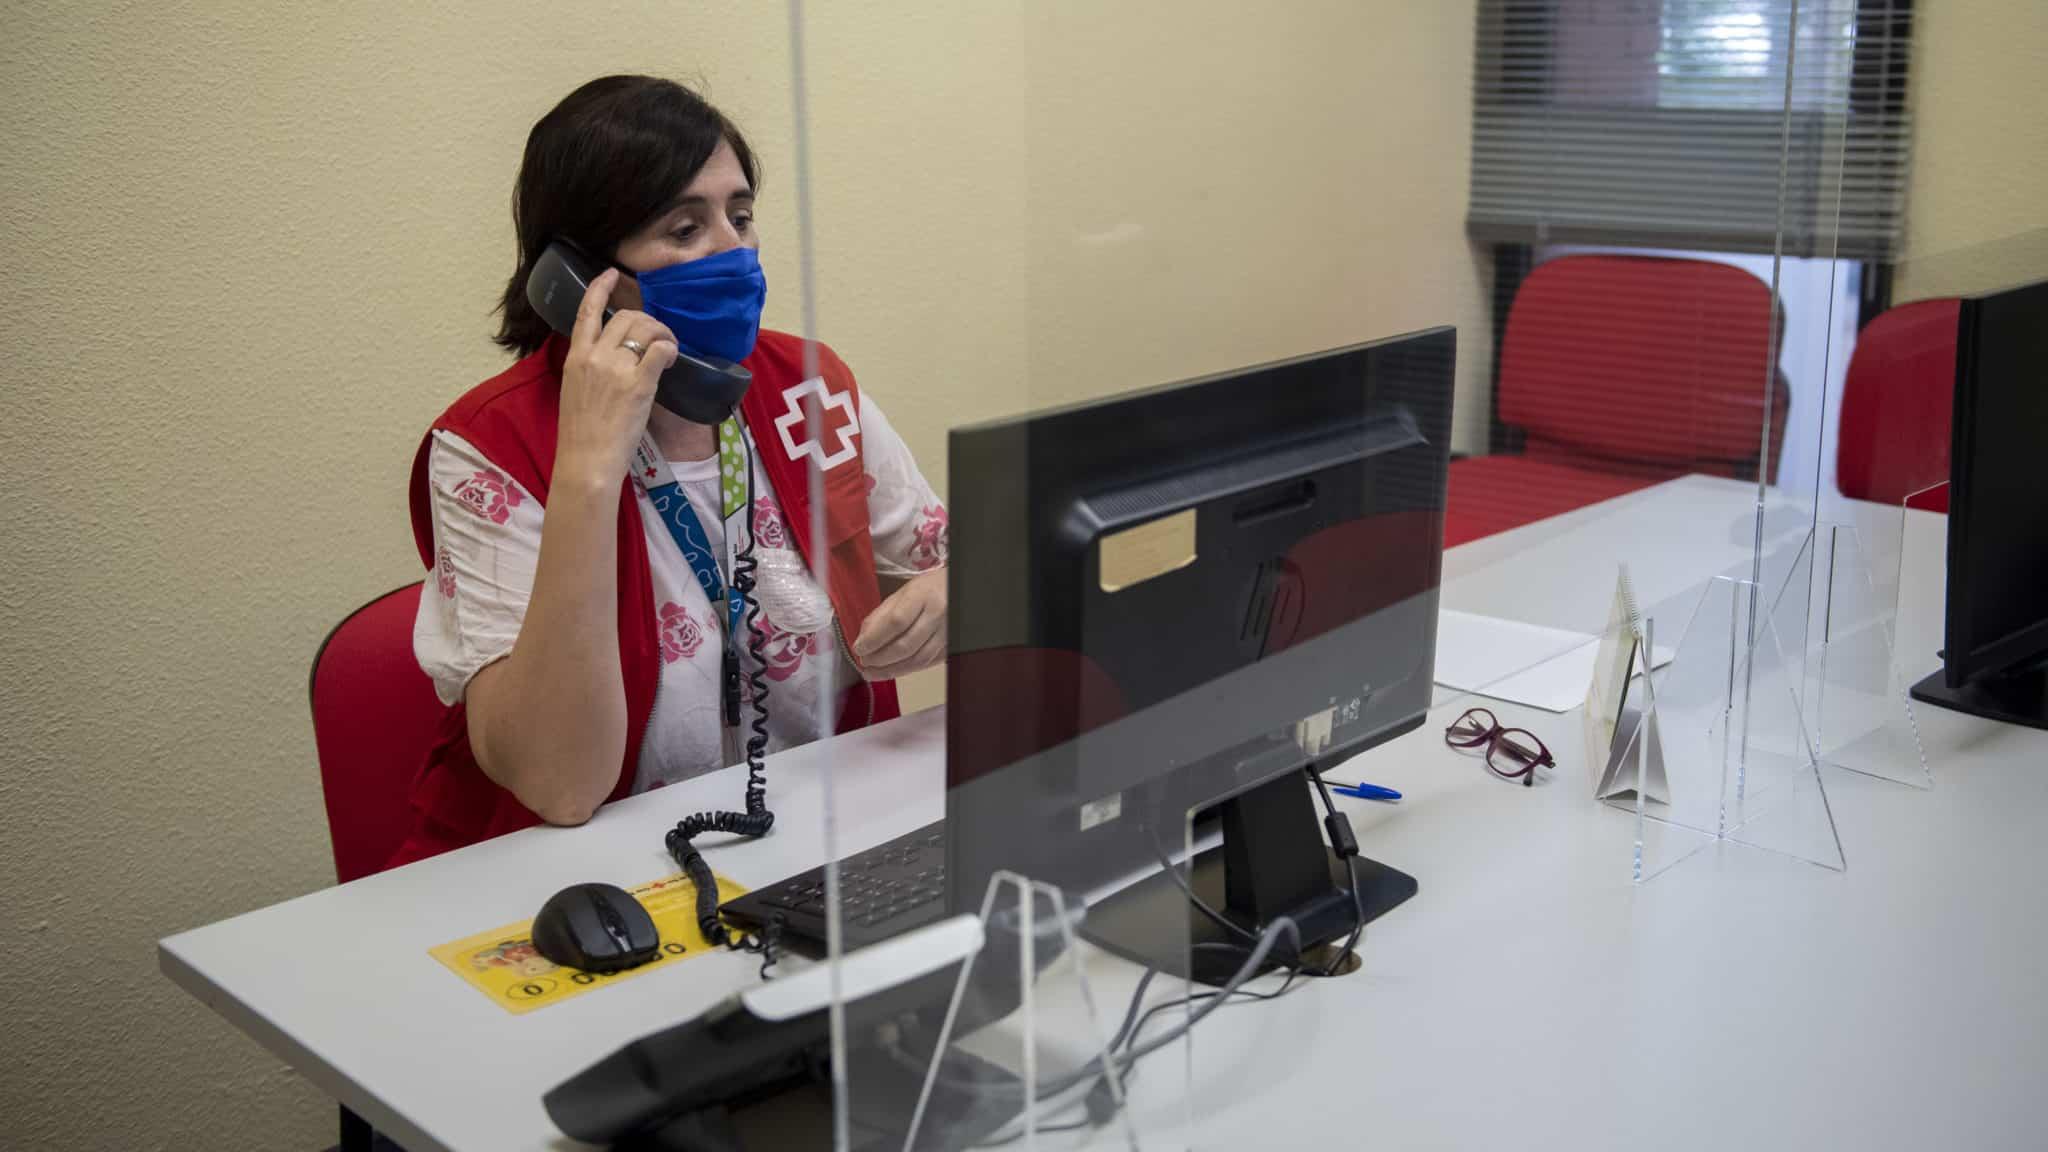 La presidenta Andreu agradece la labor de Cruz Roja durante la pandemia 4